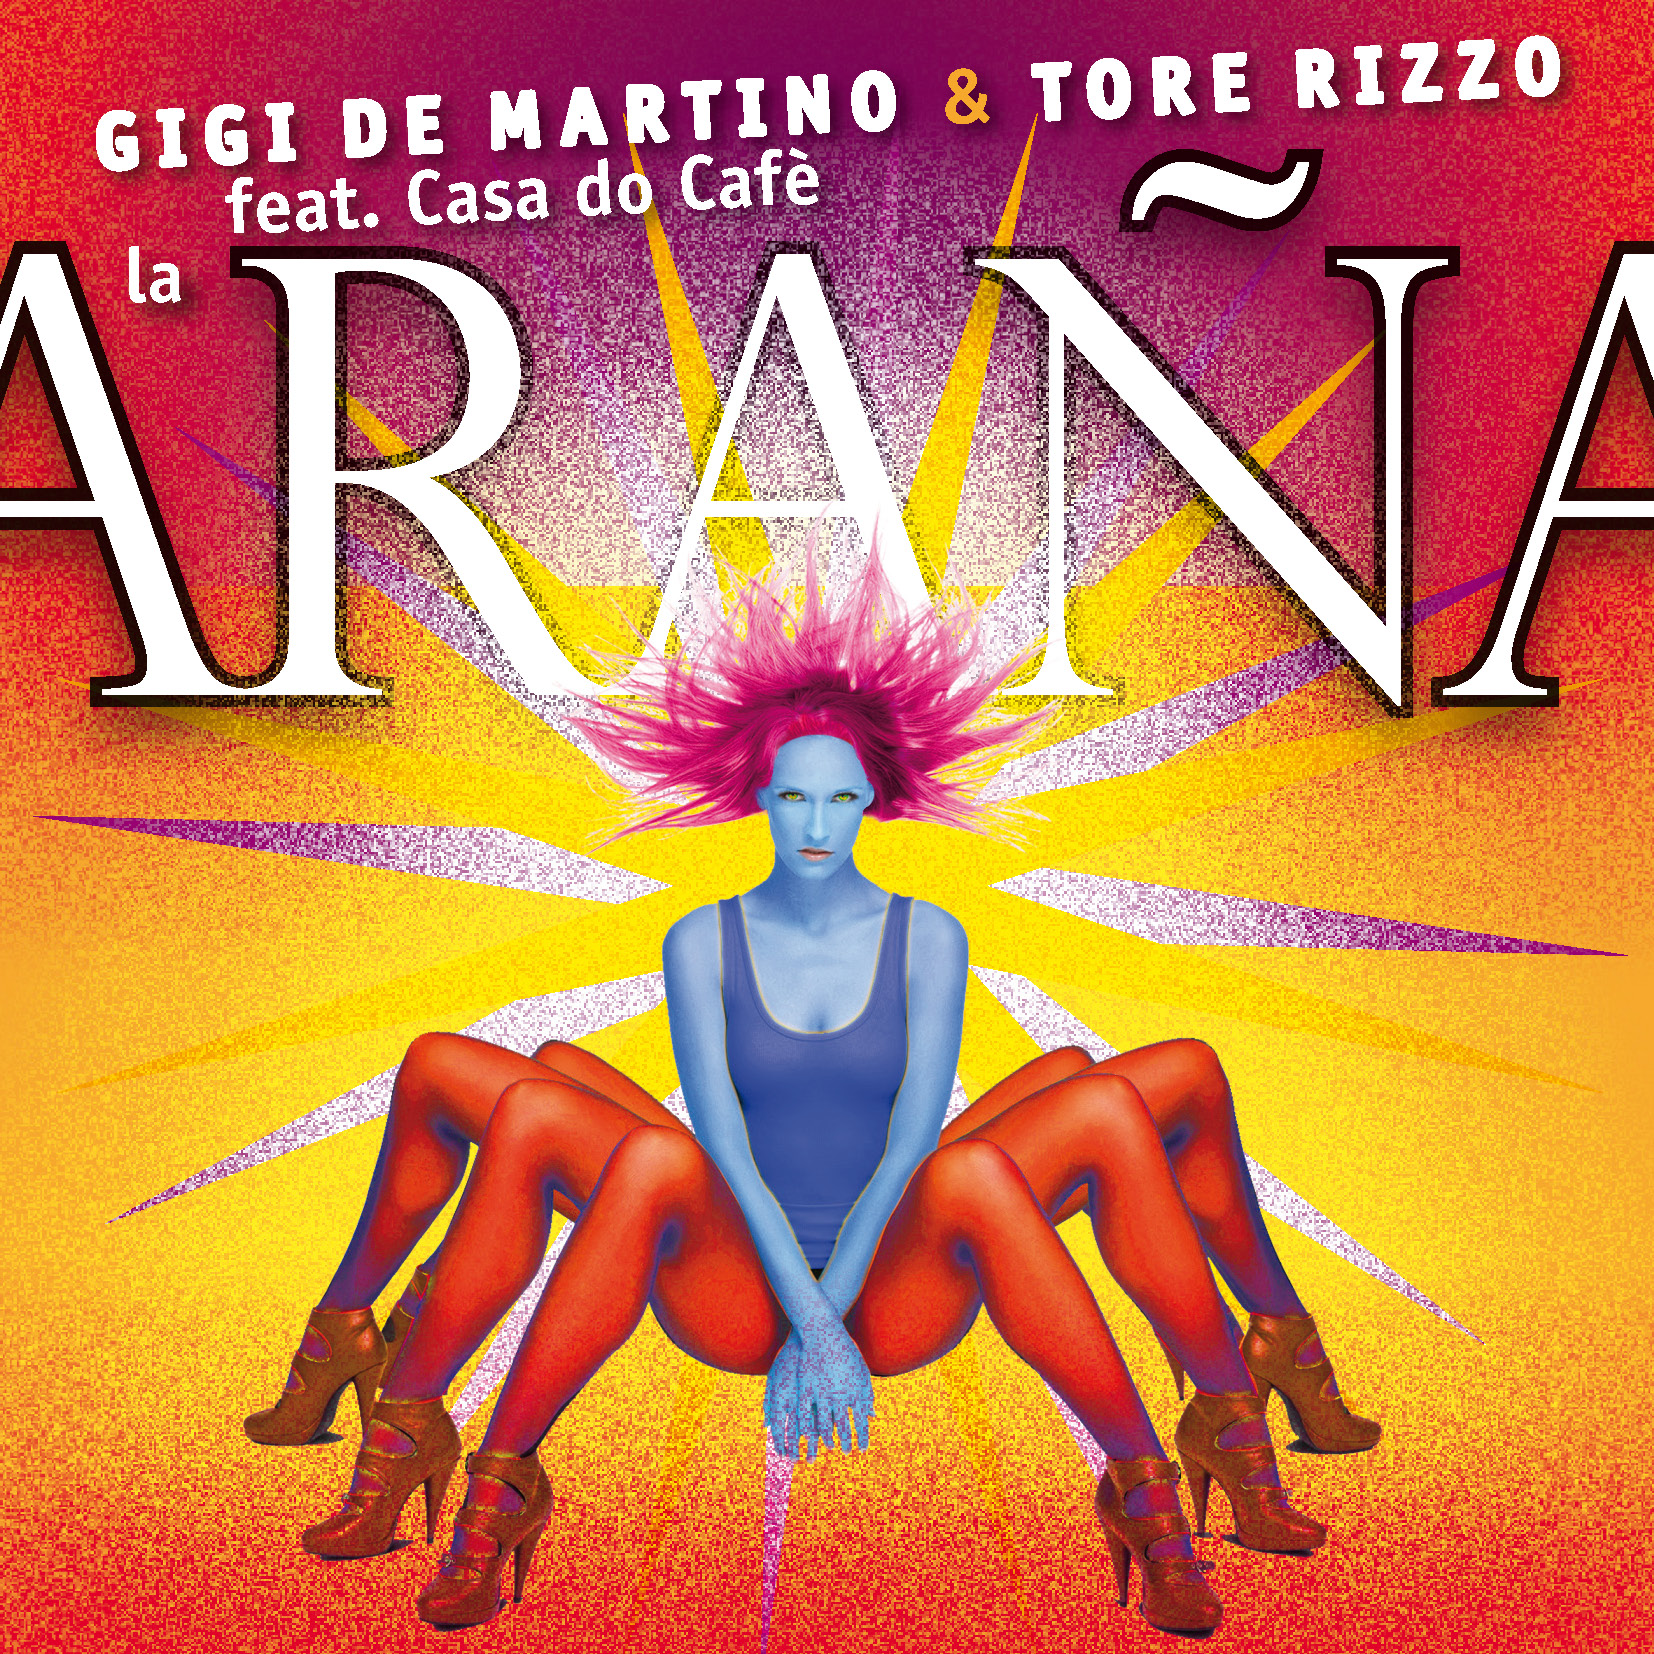 La Arana Gigi de Martino